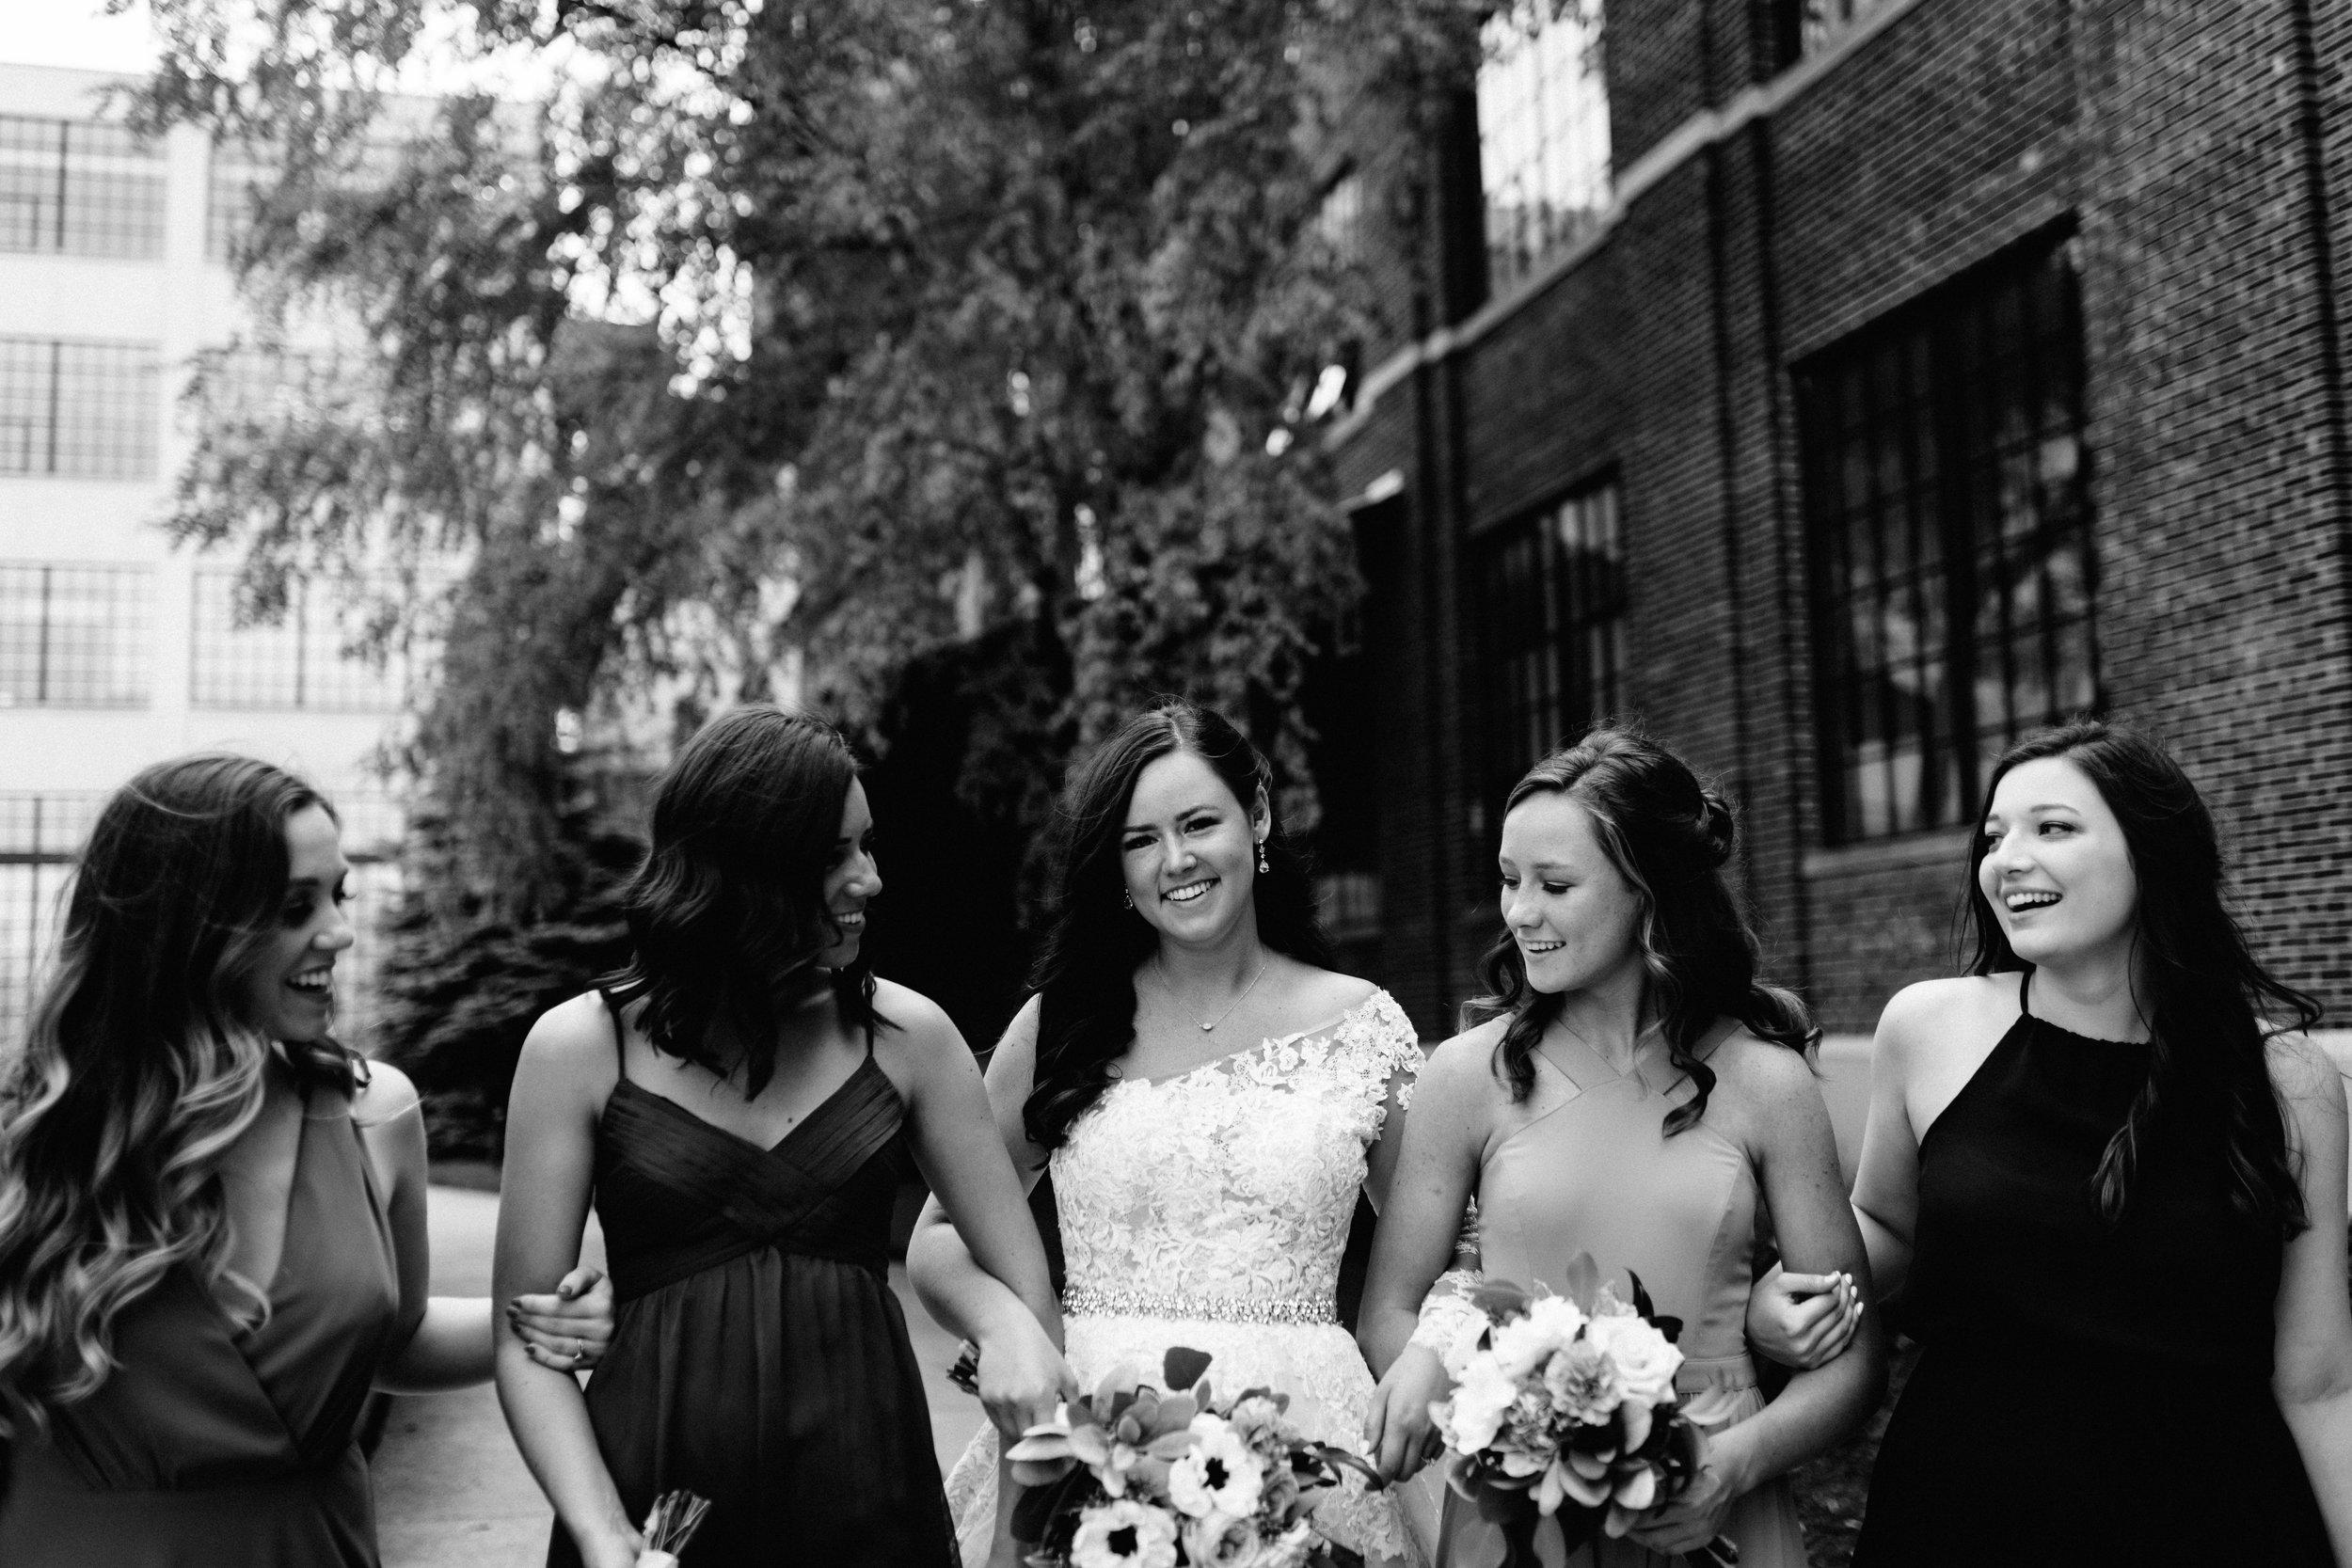 GRAYCENTOMHAMILTON-GRAND-RAPIDS-WEDDING-PHOTOGRAPHY-43.jpg